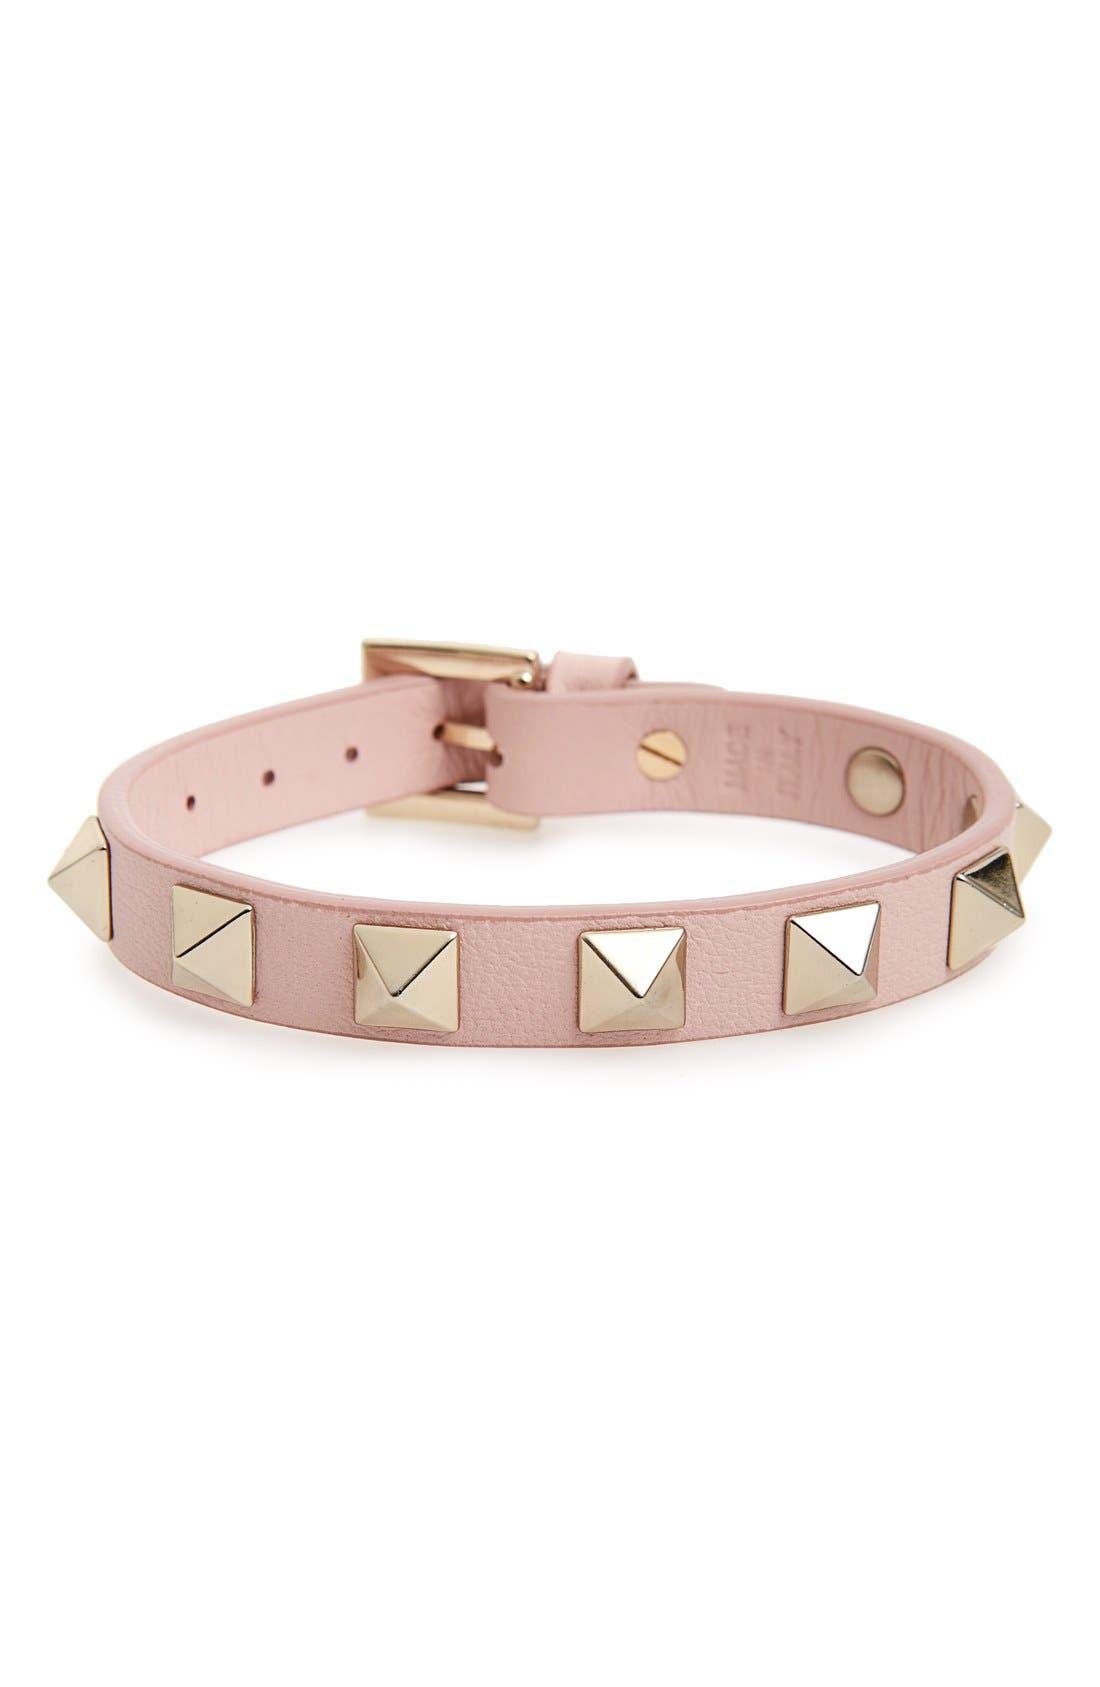 Main Image - Valentino 'Rockstud' Leather Bracelet